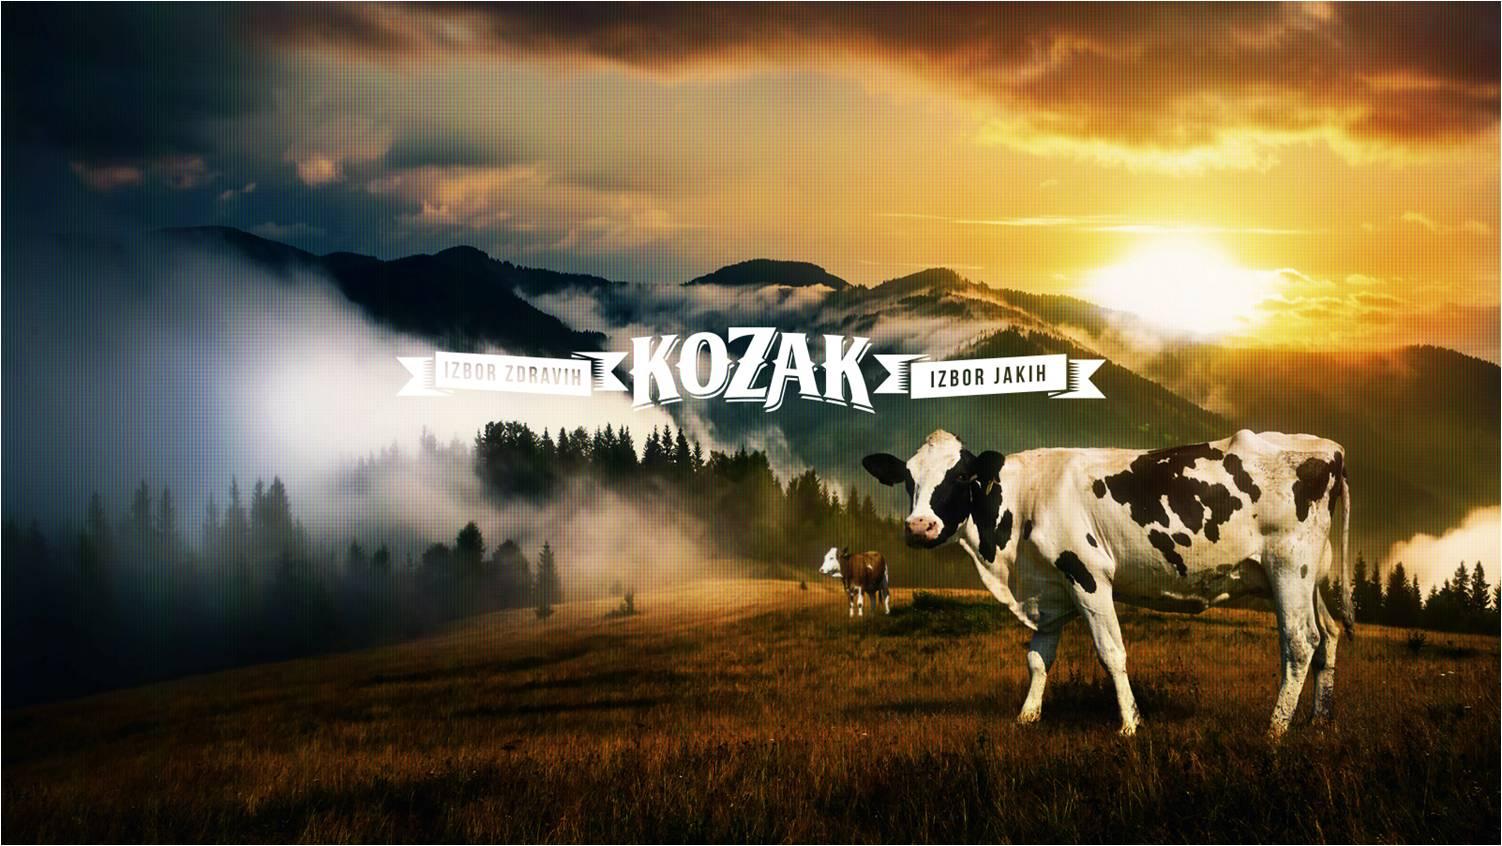 Kozak doo Beograd Kravlji i kozji sirevi